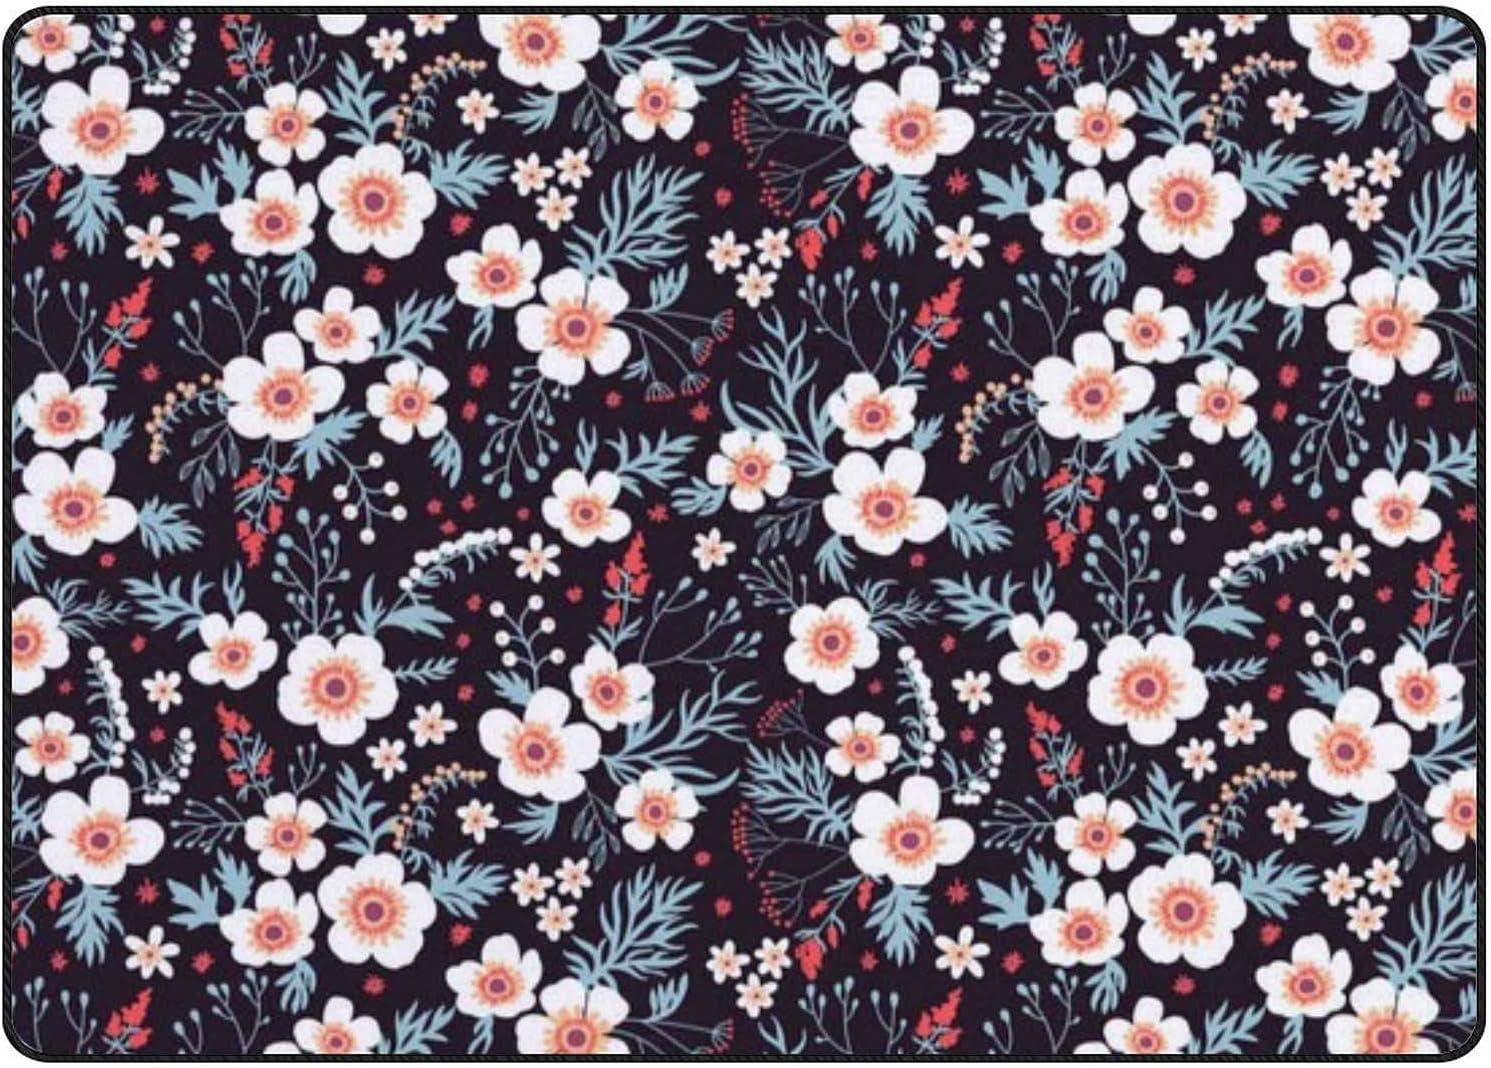 White sale Flowers Area Rug Max 59% OFF Indoor Carpets Floor Non-Slip Living Room